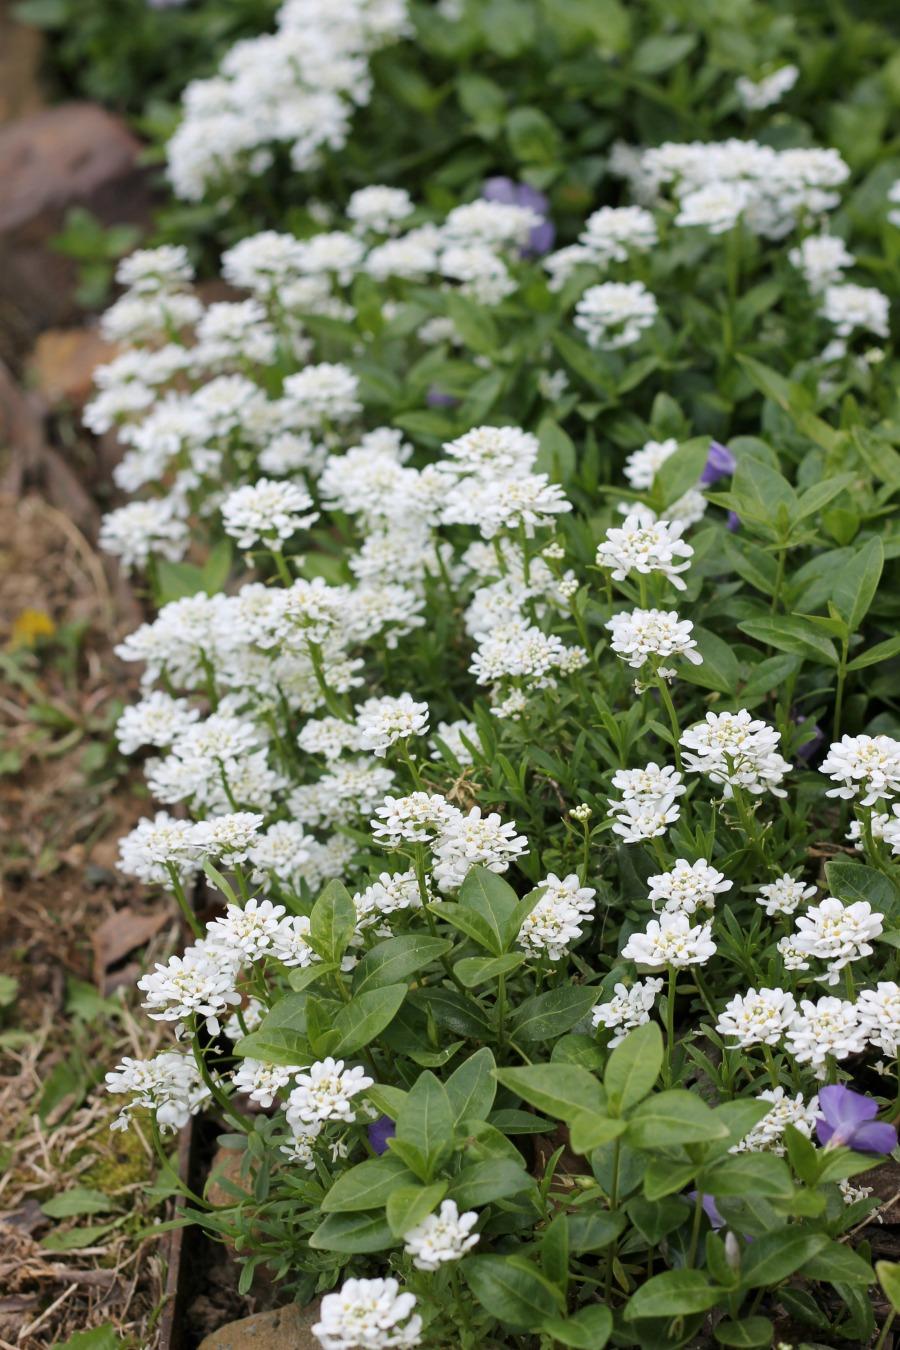 Curb Appeal Ideas - Weed Flowerbeds